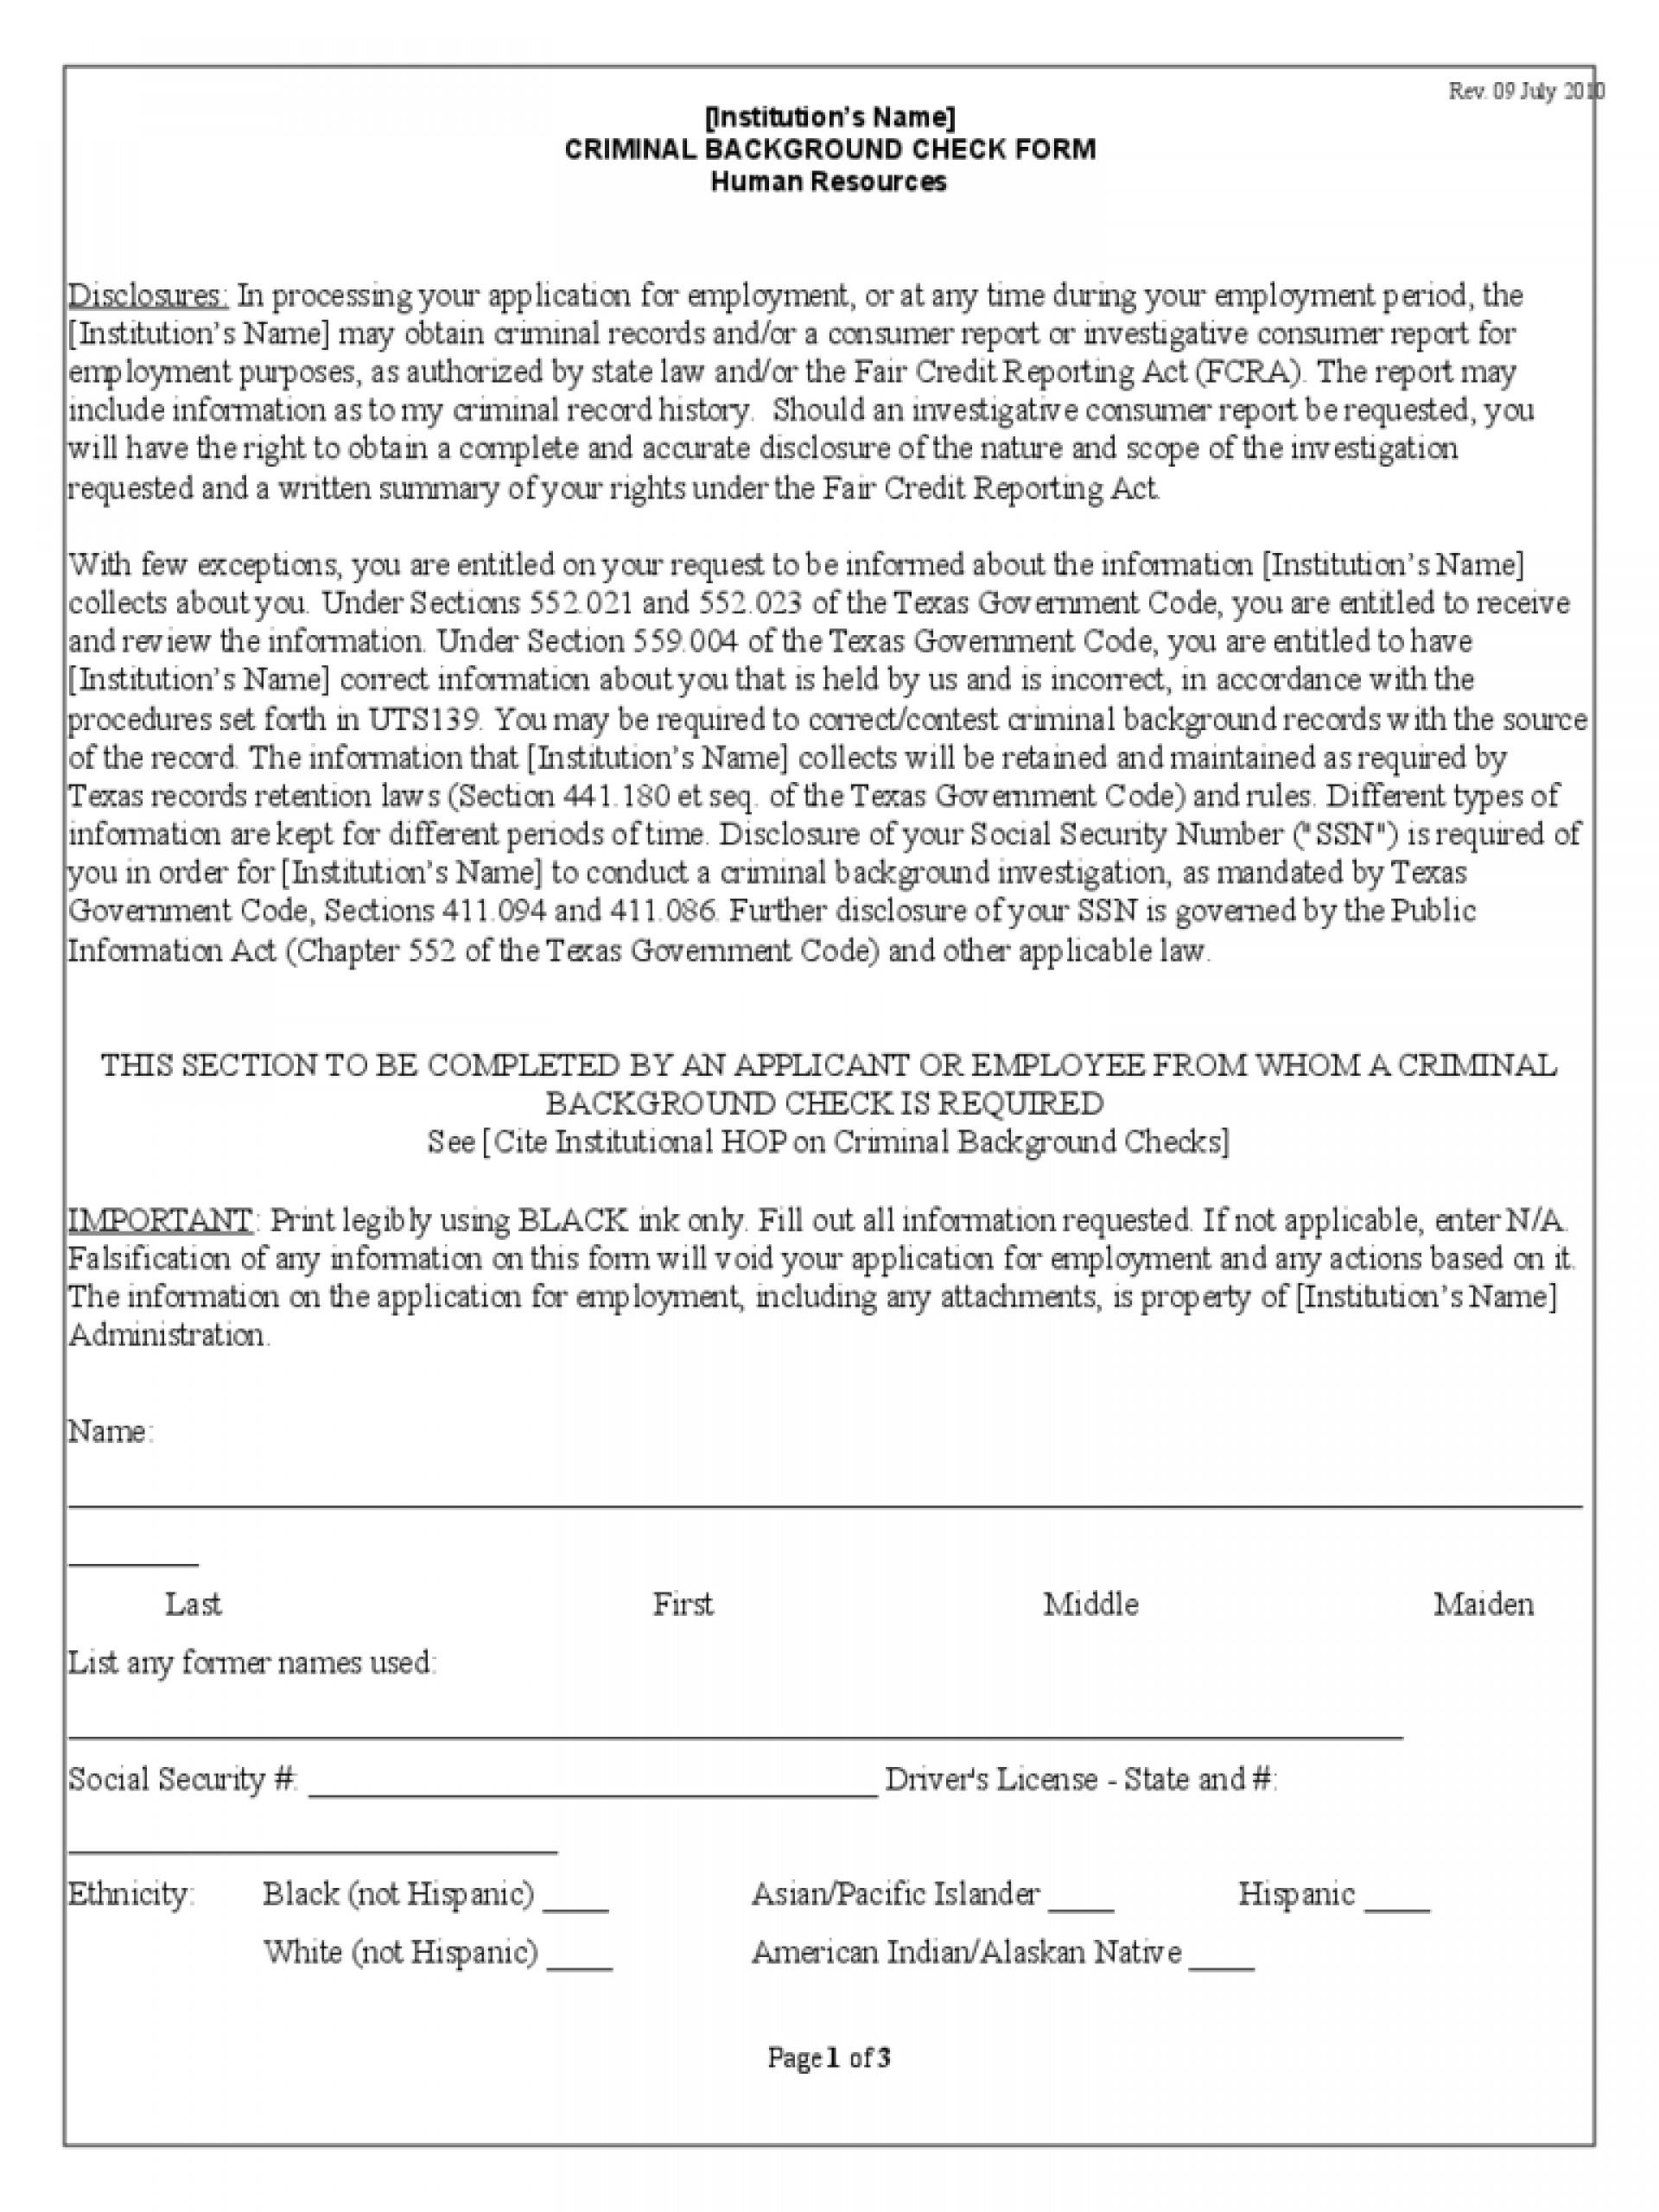 Pa Criminal History Background Check Form